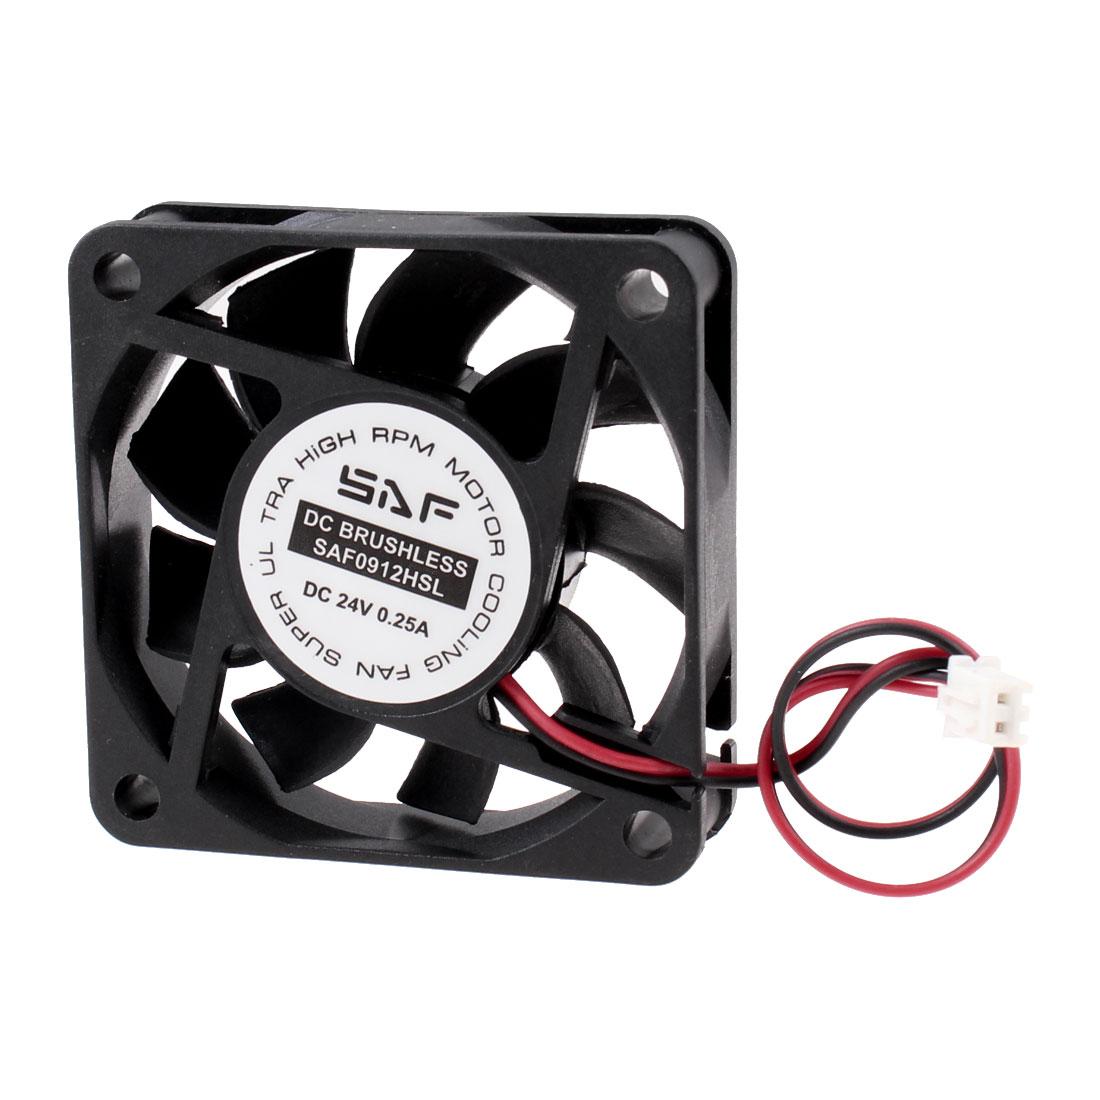 DC 24V 0.25A Cooling Fan 60mm x 15mm for Computer Case CPU Cooler